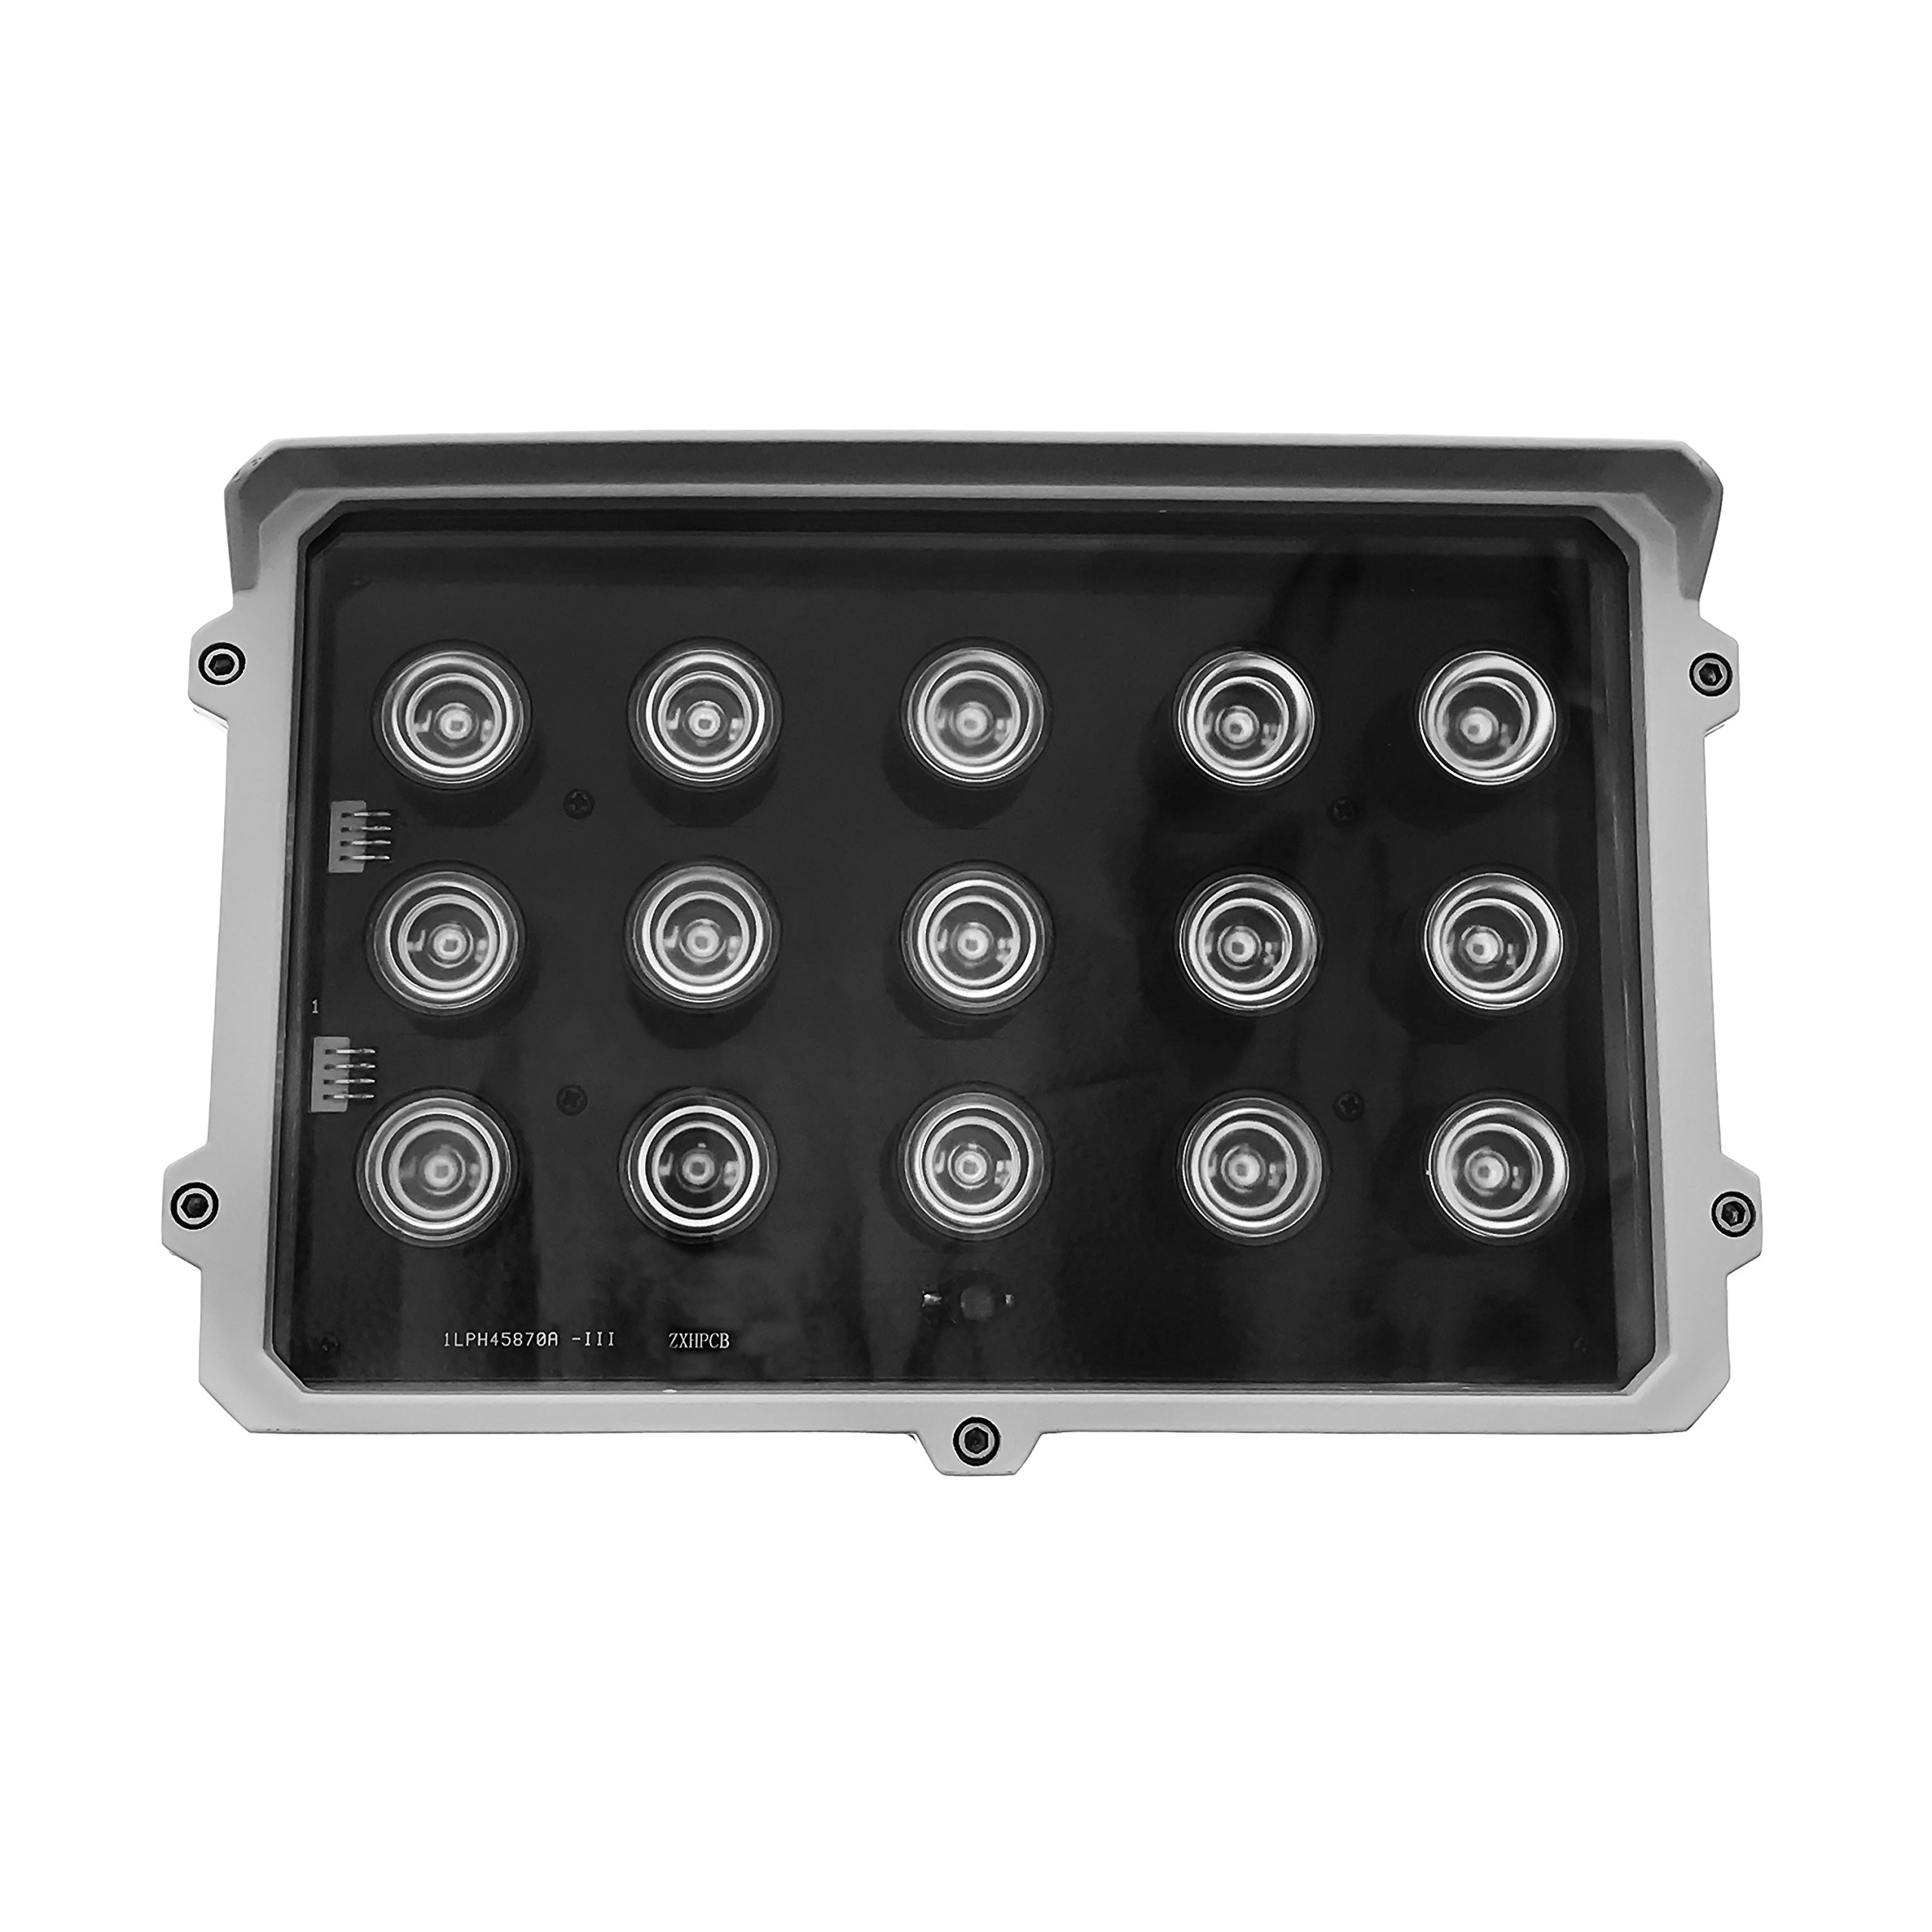 CMVision CMVE-IR15 Wide Angle 60-80° Power LED IR Array Illuminator 200-300' Long Range with Free 12VDC 3A Power Adaptor, 15 Piece by CMVision (Image #1)